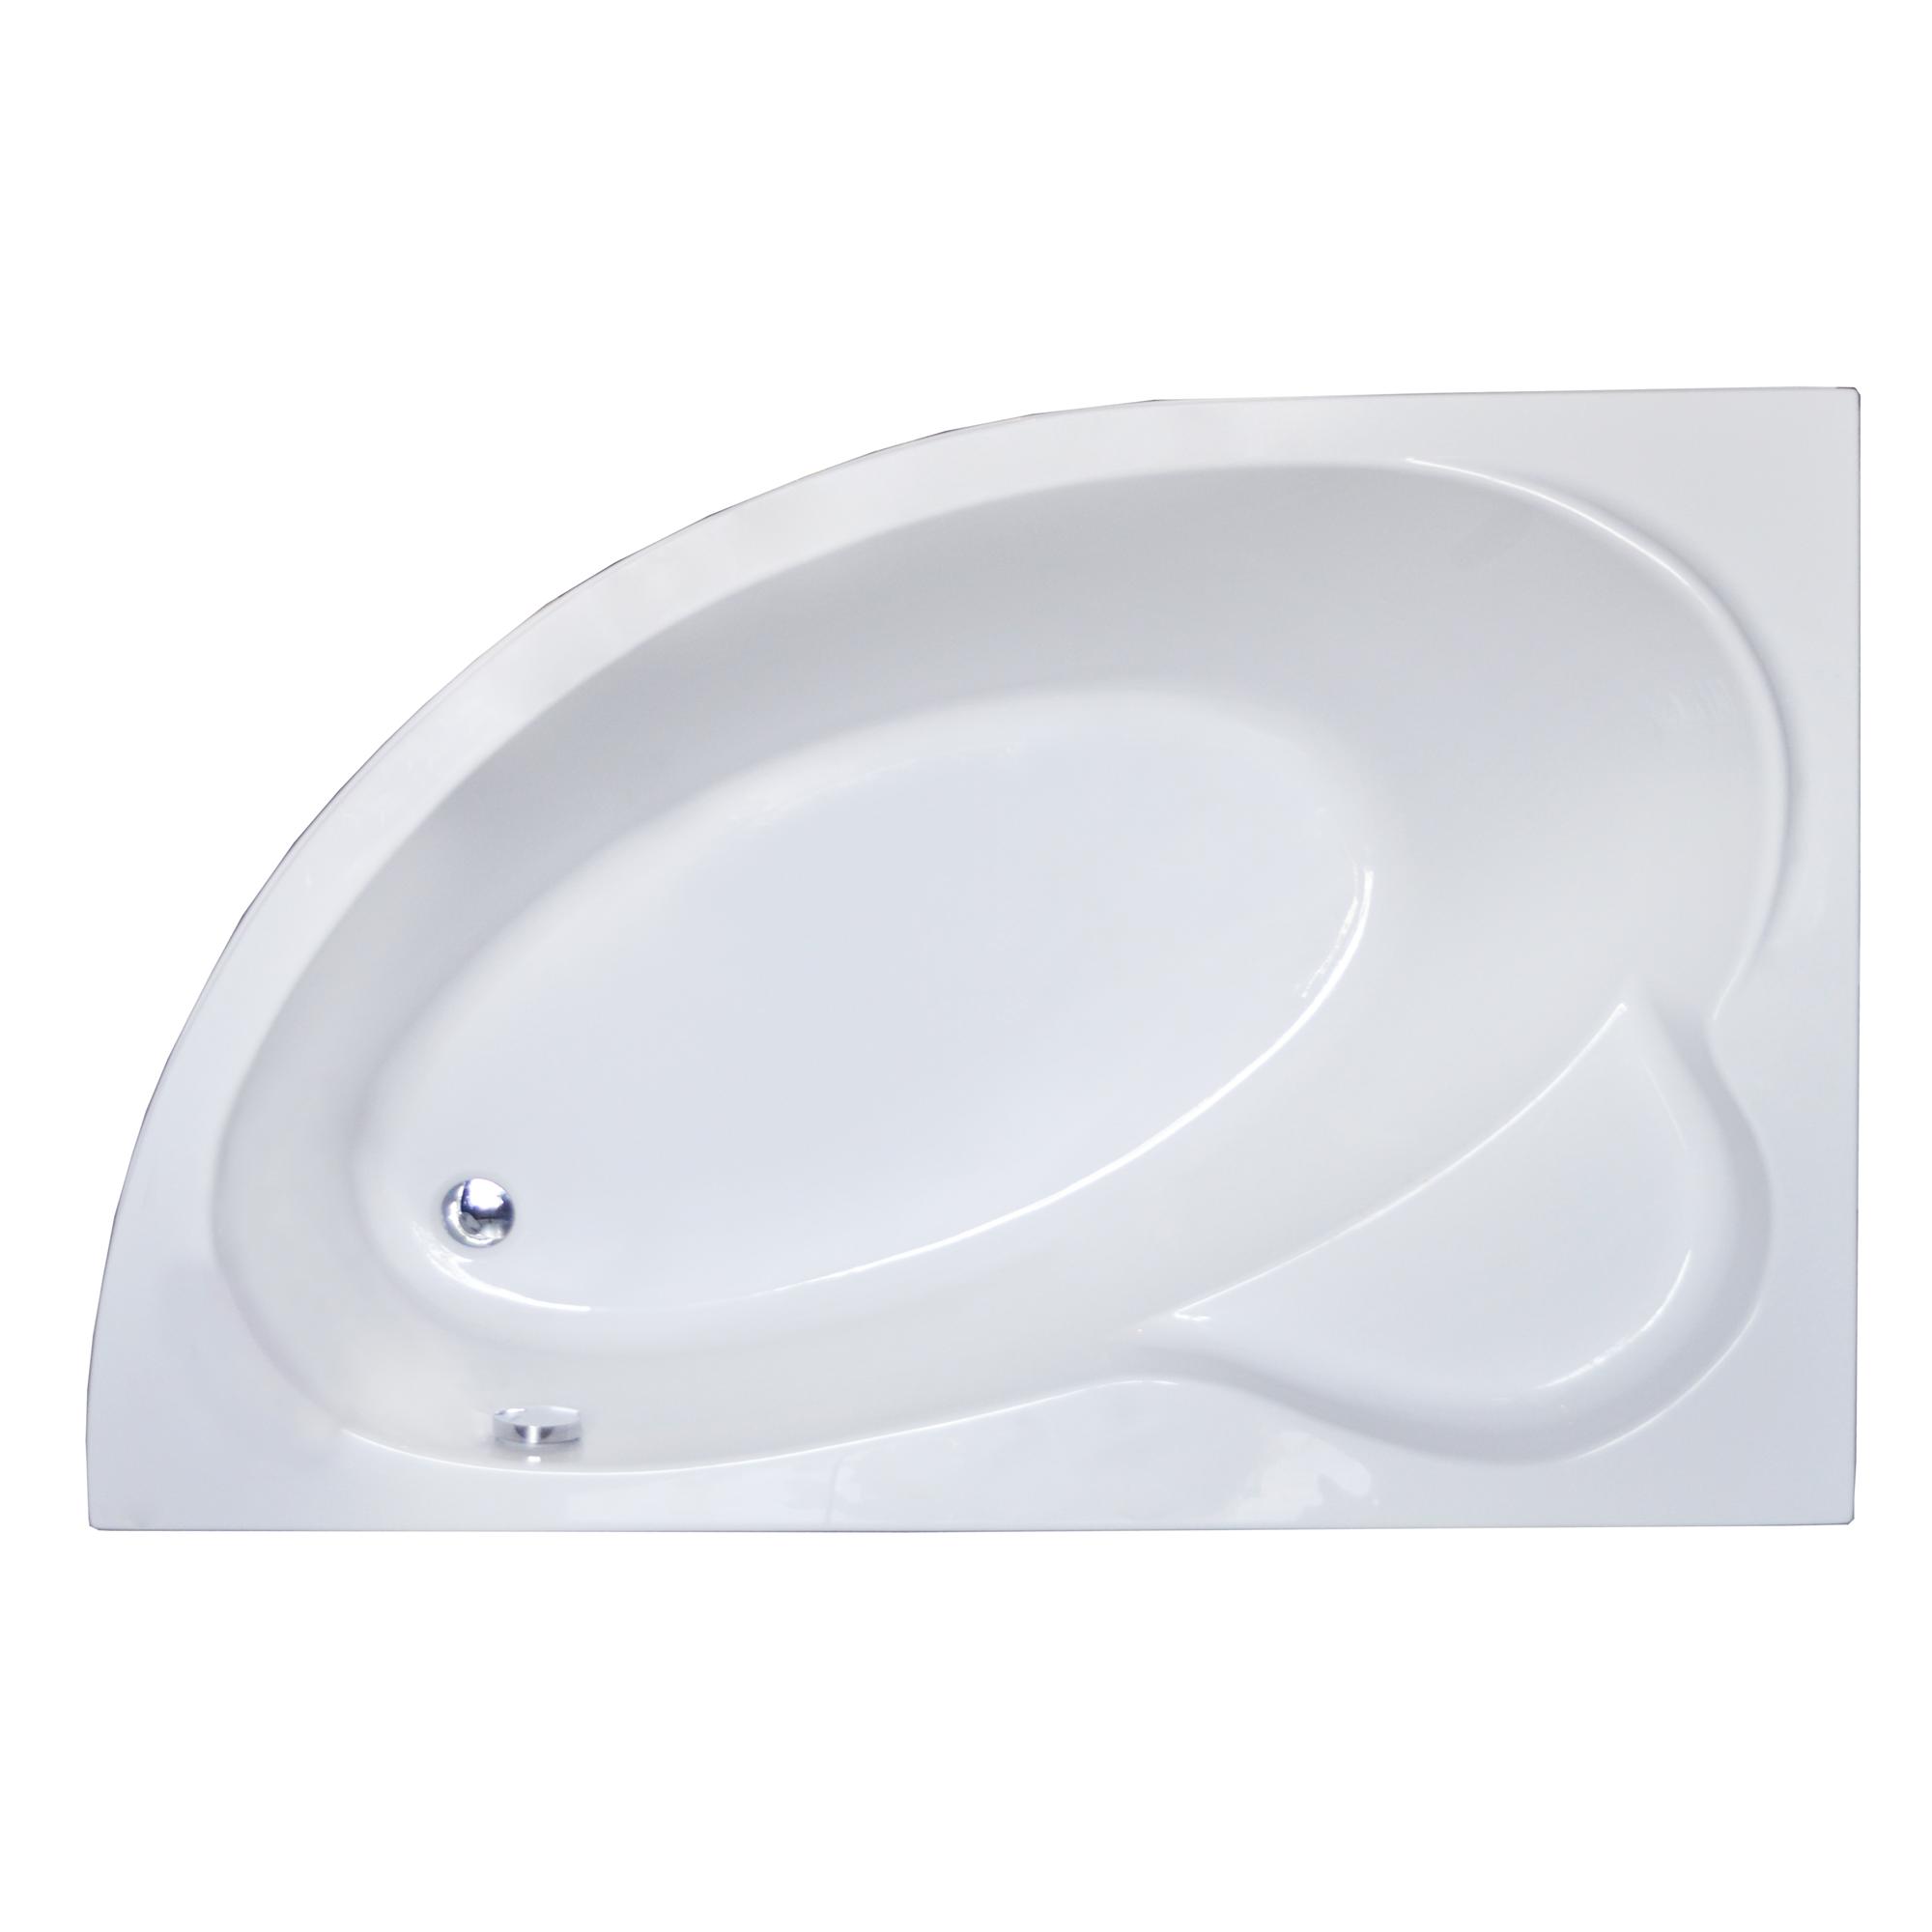 Акриловая ванна Royal bath Alpine RB819101 160х100 L акриловая ванна royal bath alpine rb 819101 правая 160х100 rb819101r